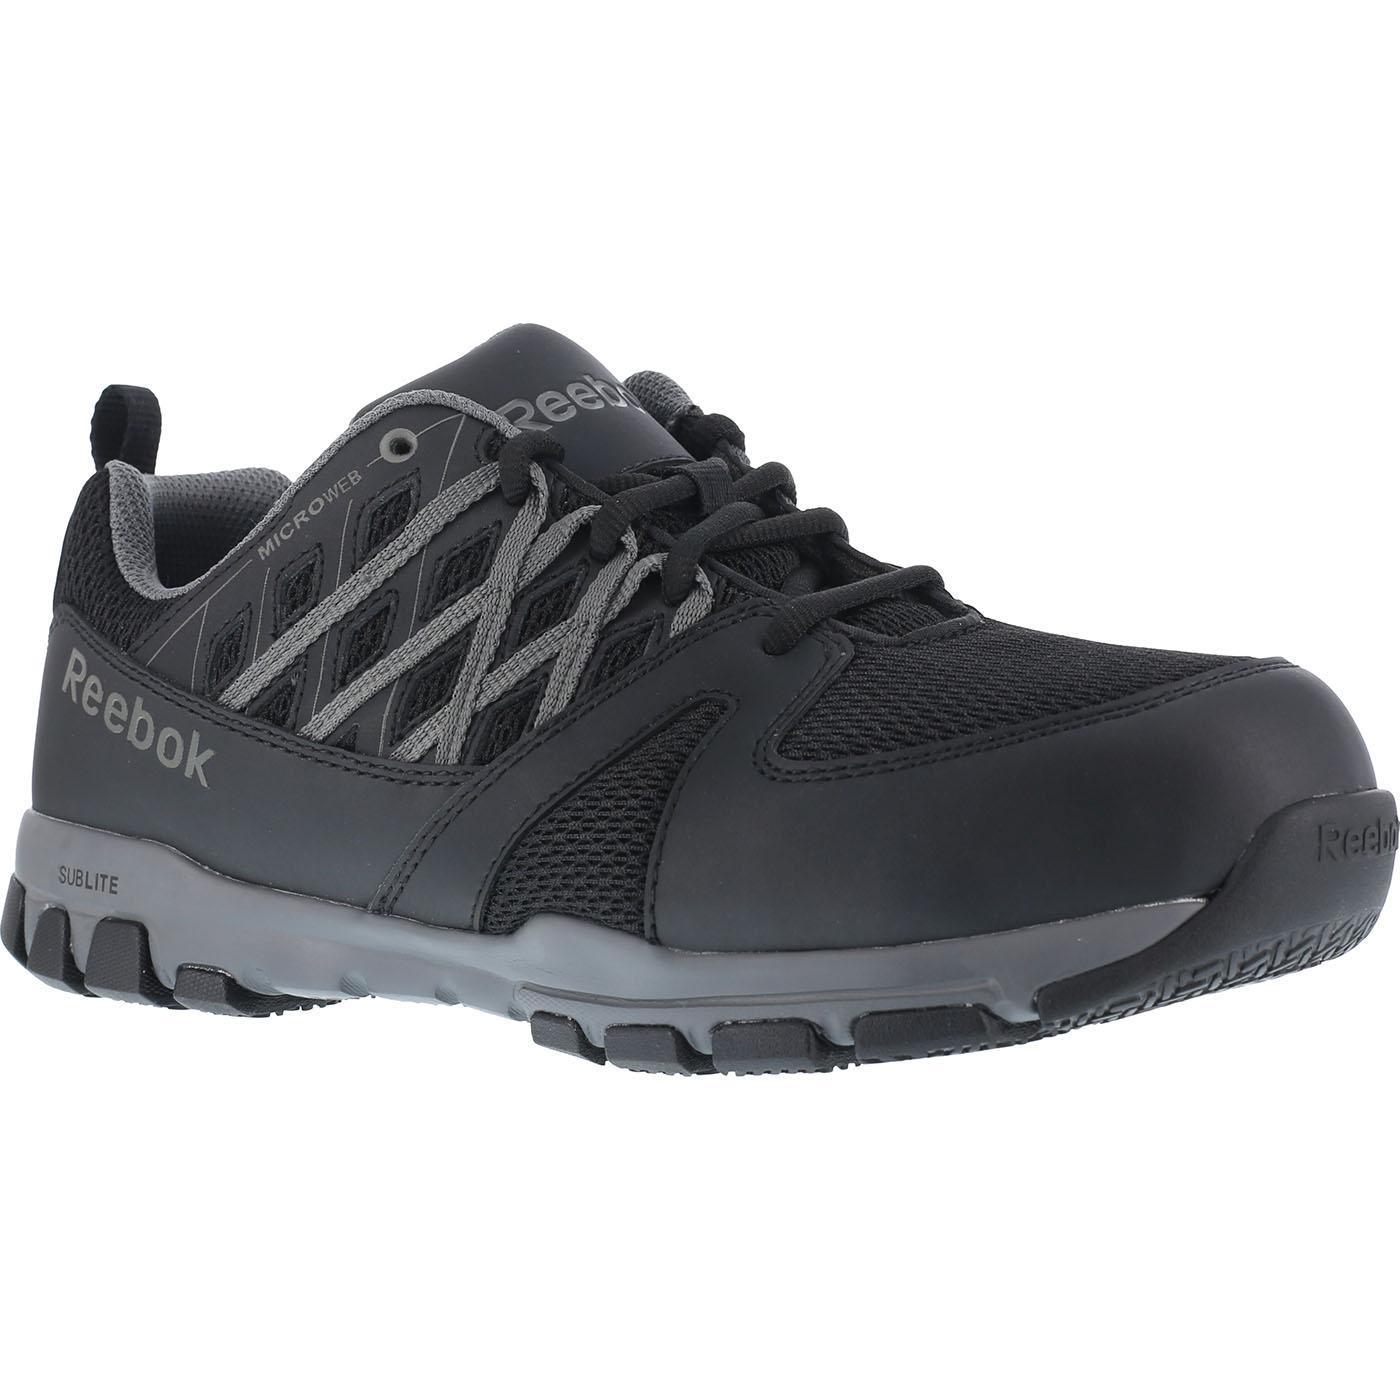 3ee3e24b1bf Reebok Sublite Steel Toe Static-Dissipative Slip-Resistant Work Athletic  ShoeReebok Sublite Steel Toe Static-Dissipative Slip-Resistant Work  Athletic Shoe